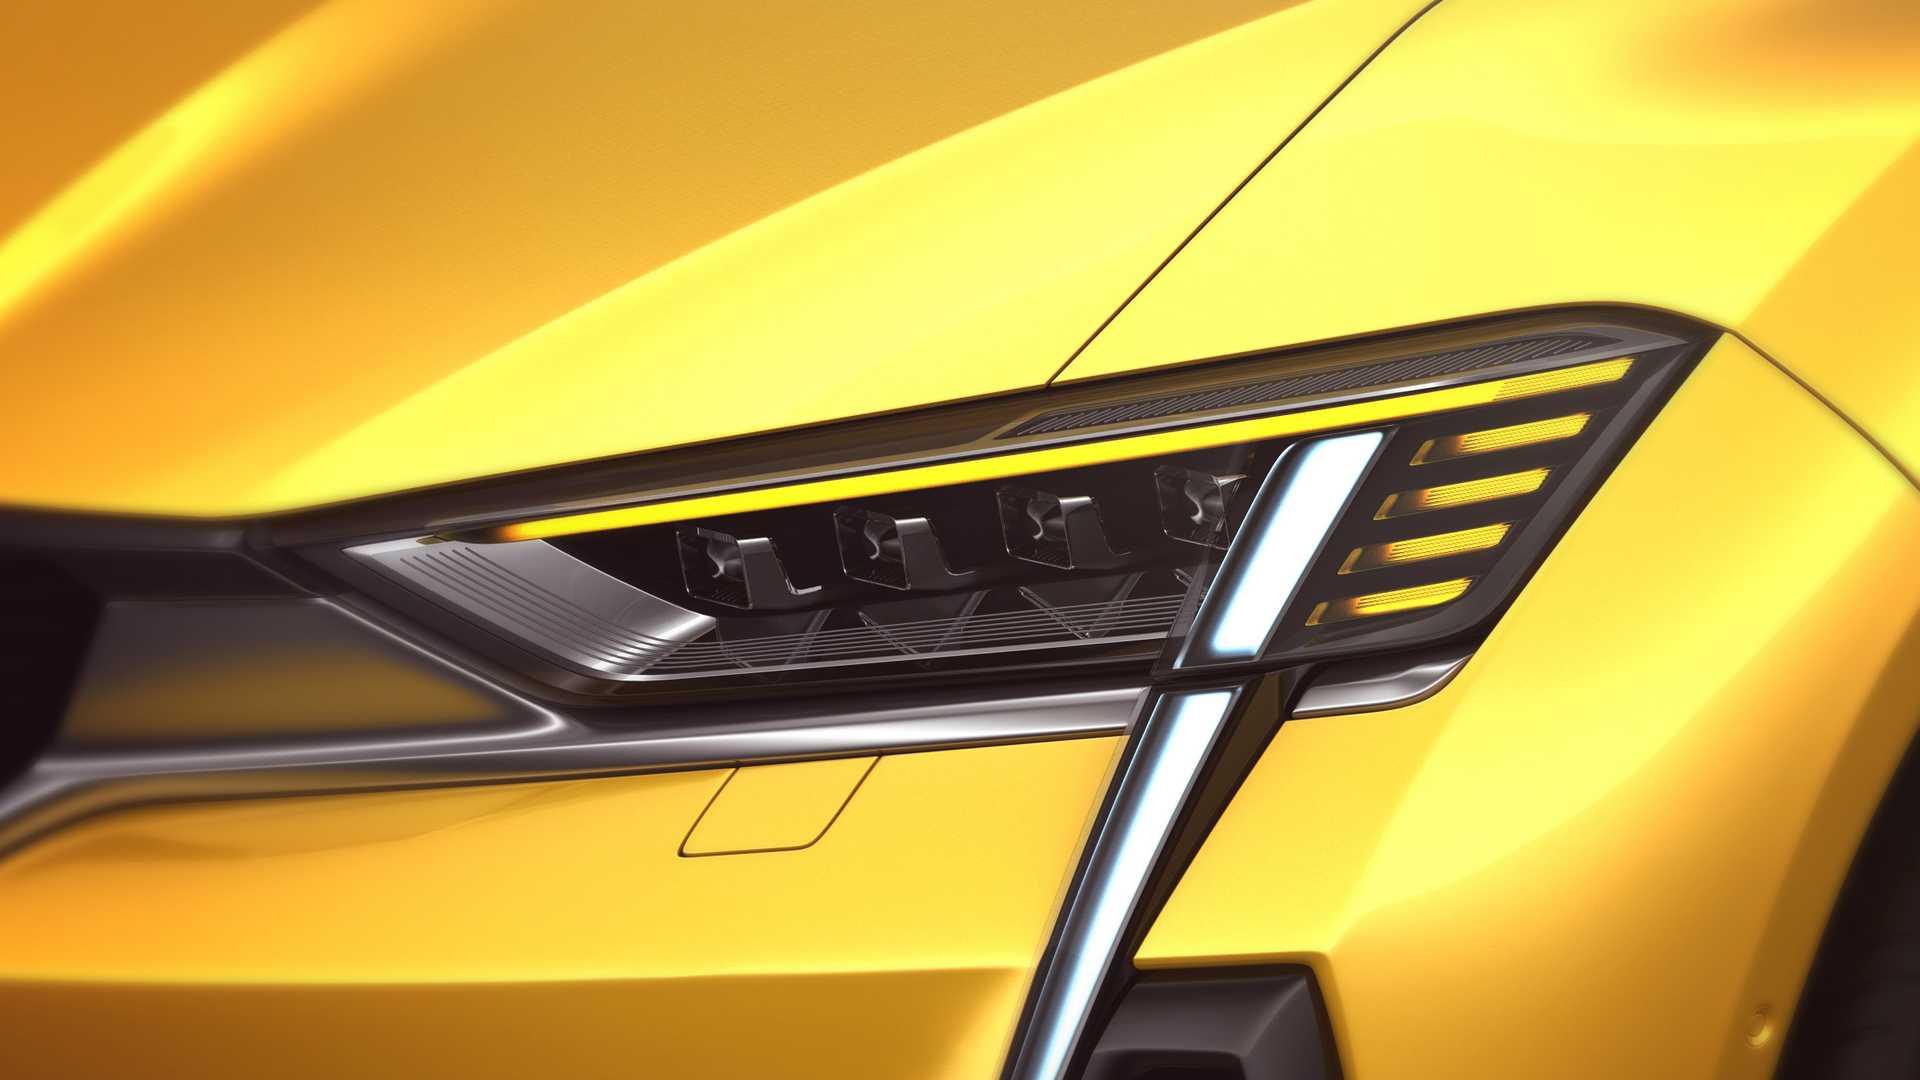 2020_Peugeot_RCZ_rendering_0020